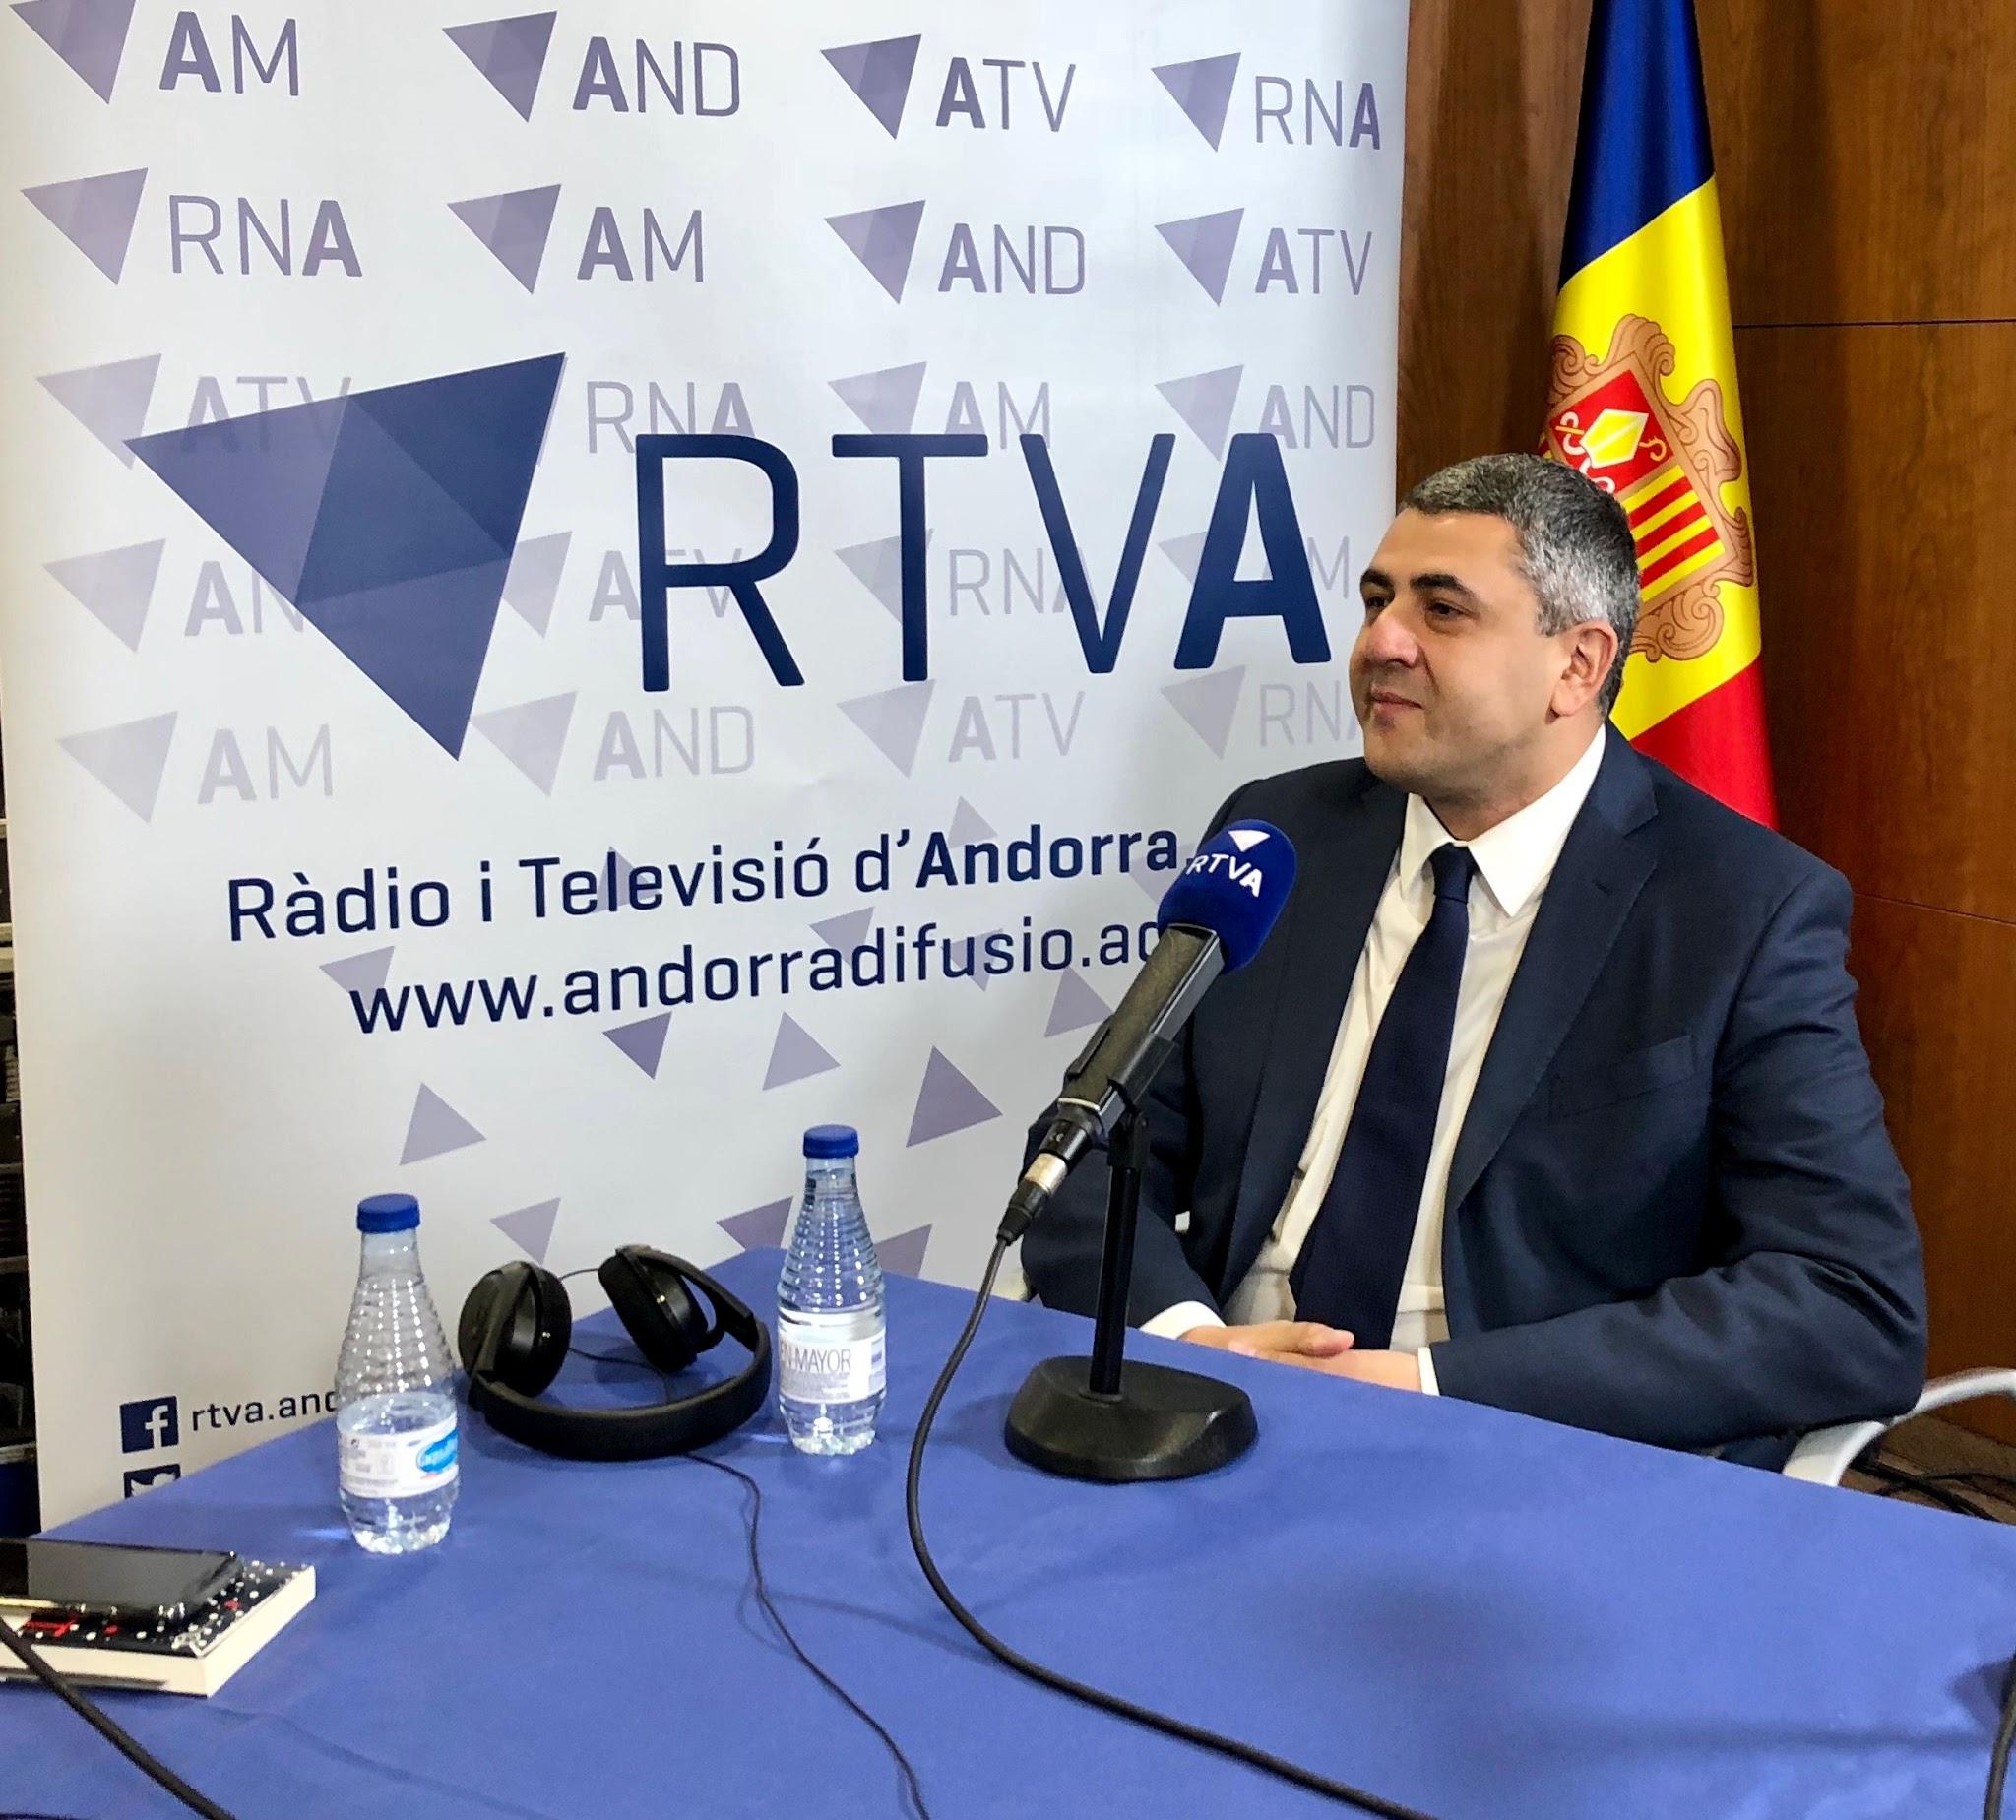 Zurab Pololikashvili, secretari general de l'OMT